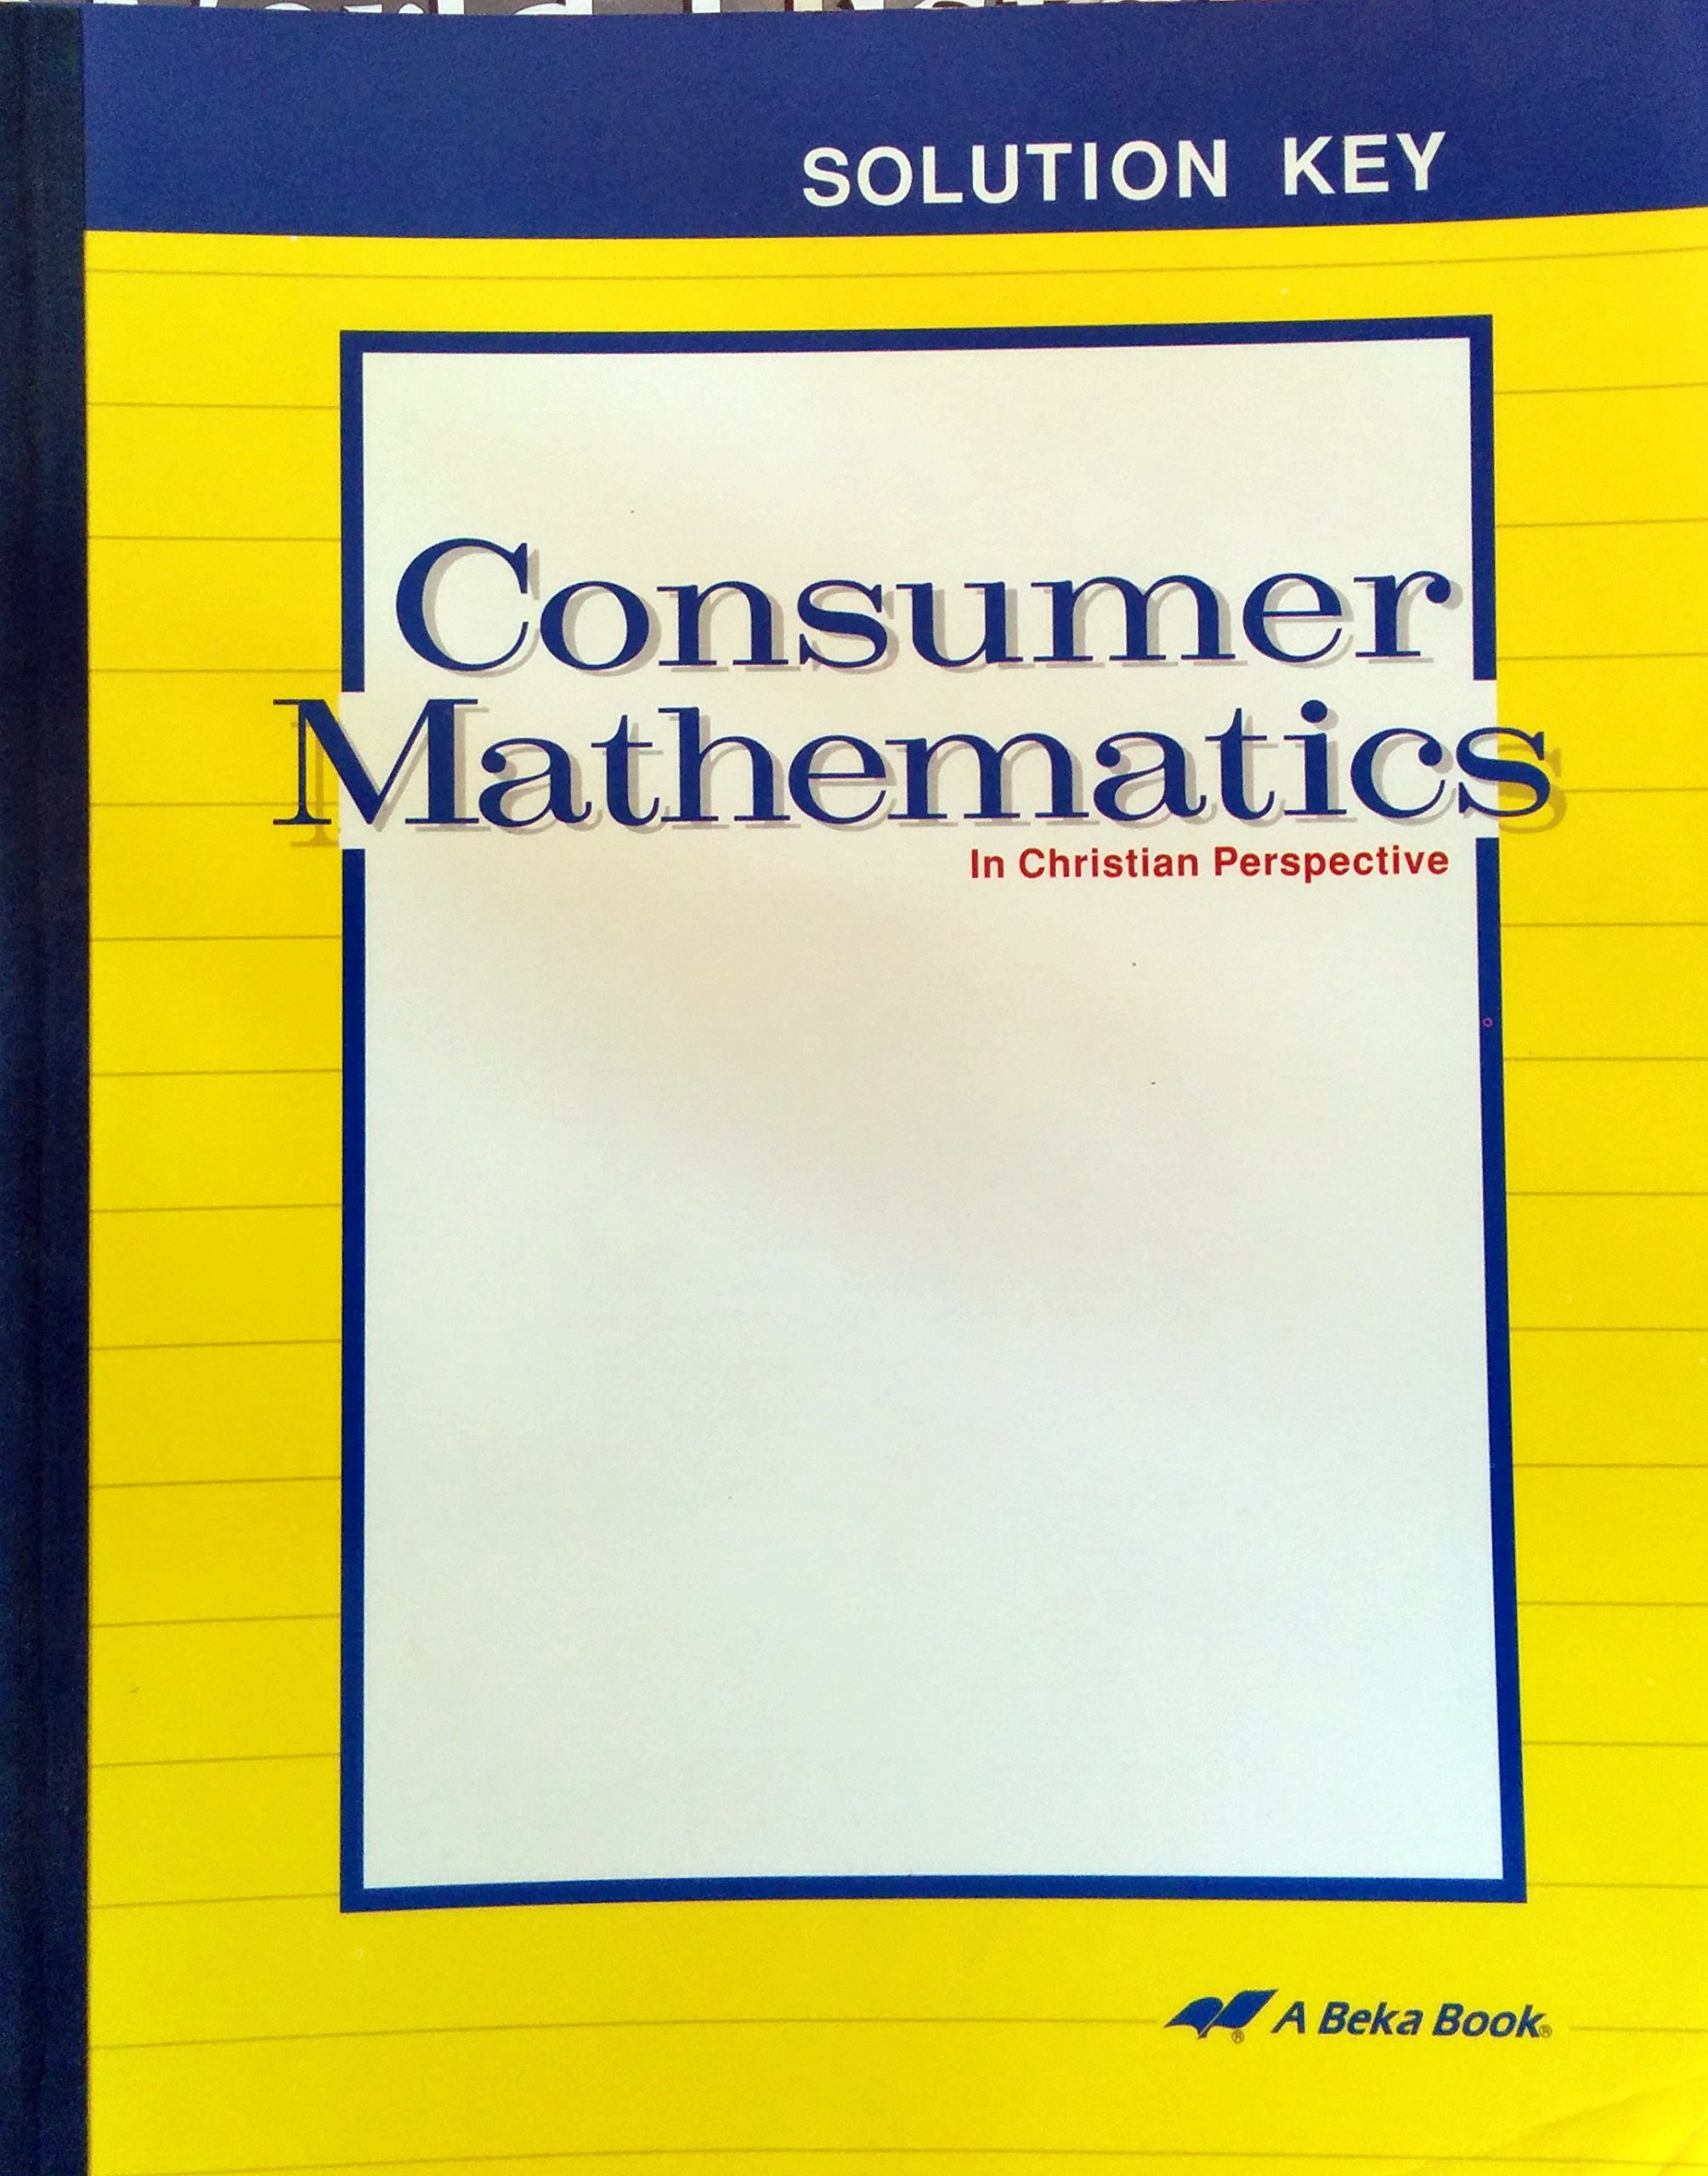 CONSUMER MATHEMATICS - SOLUTION KEY (59471): Amazon.com: Books